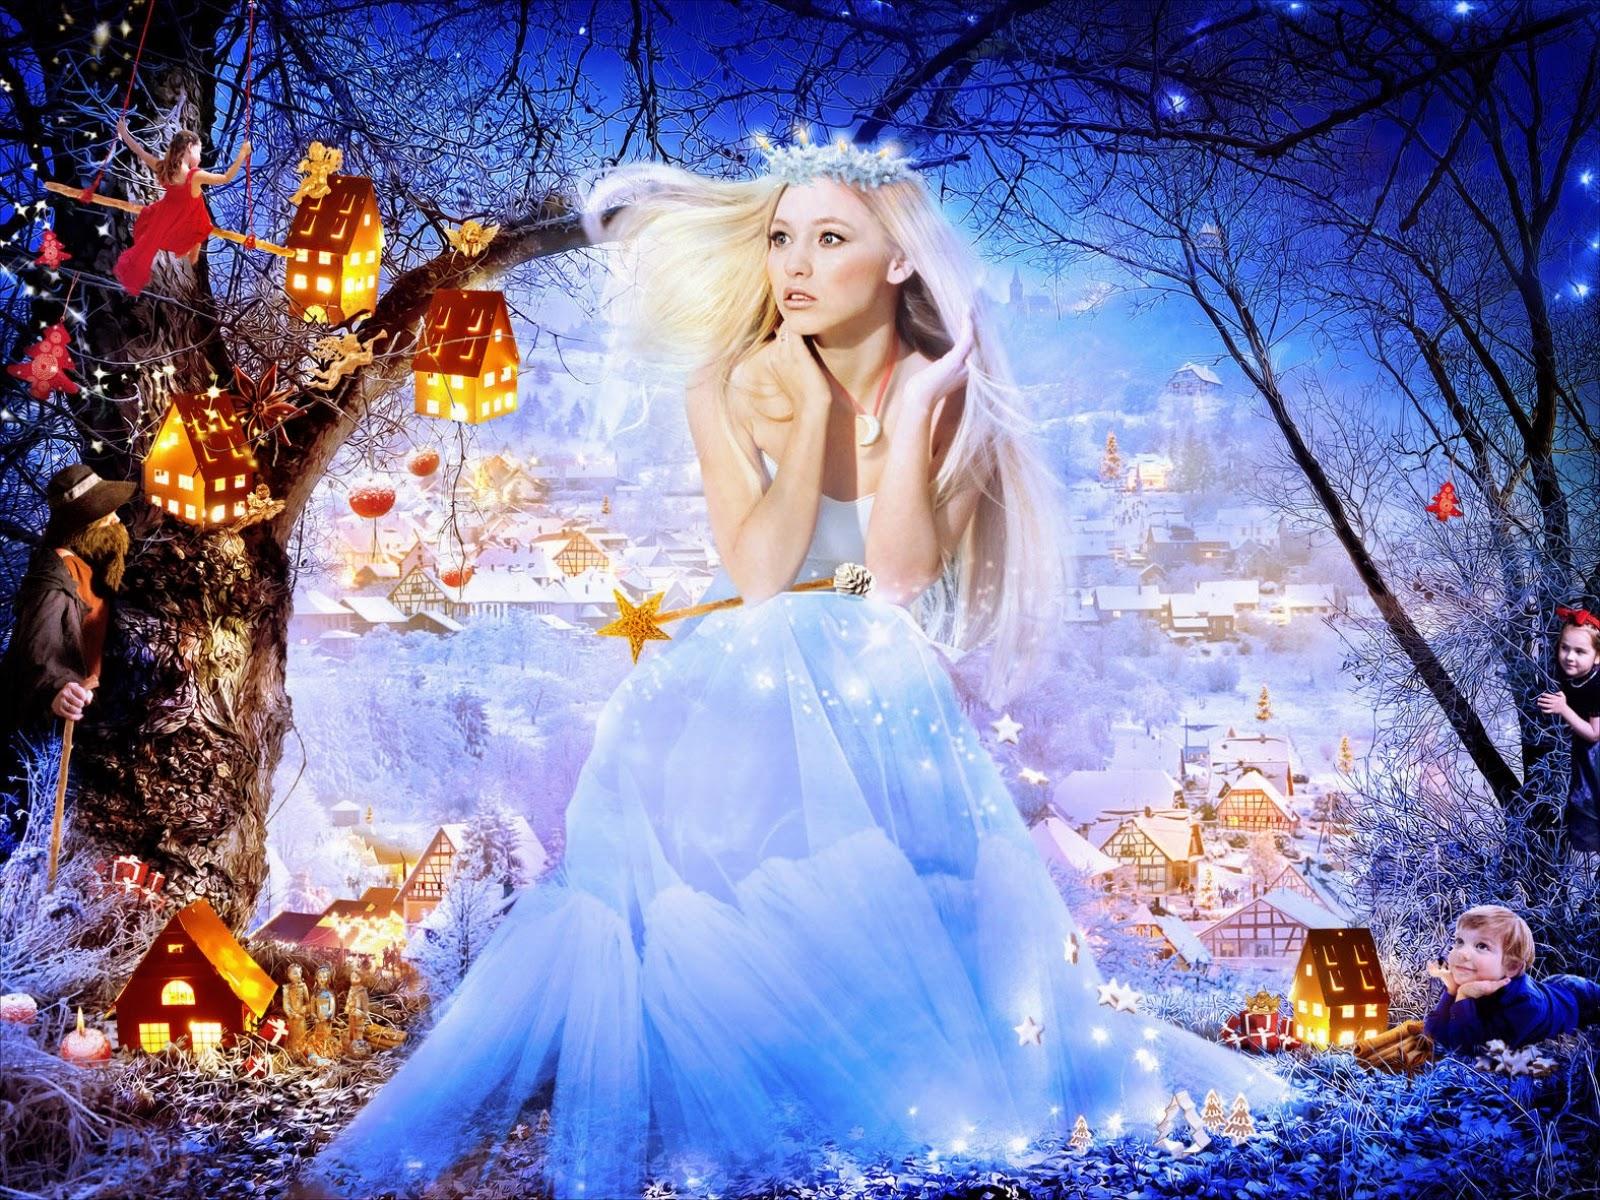 image Cameron diaz drew barrymore lucy liu charlies angels 2